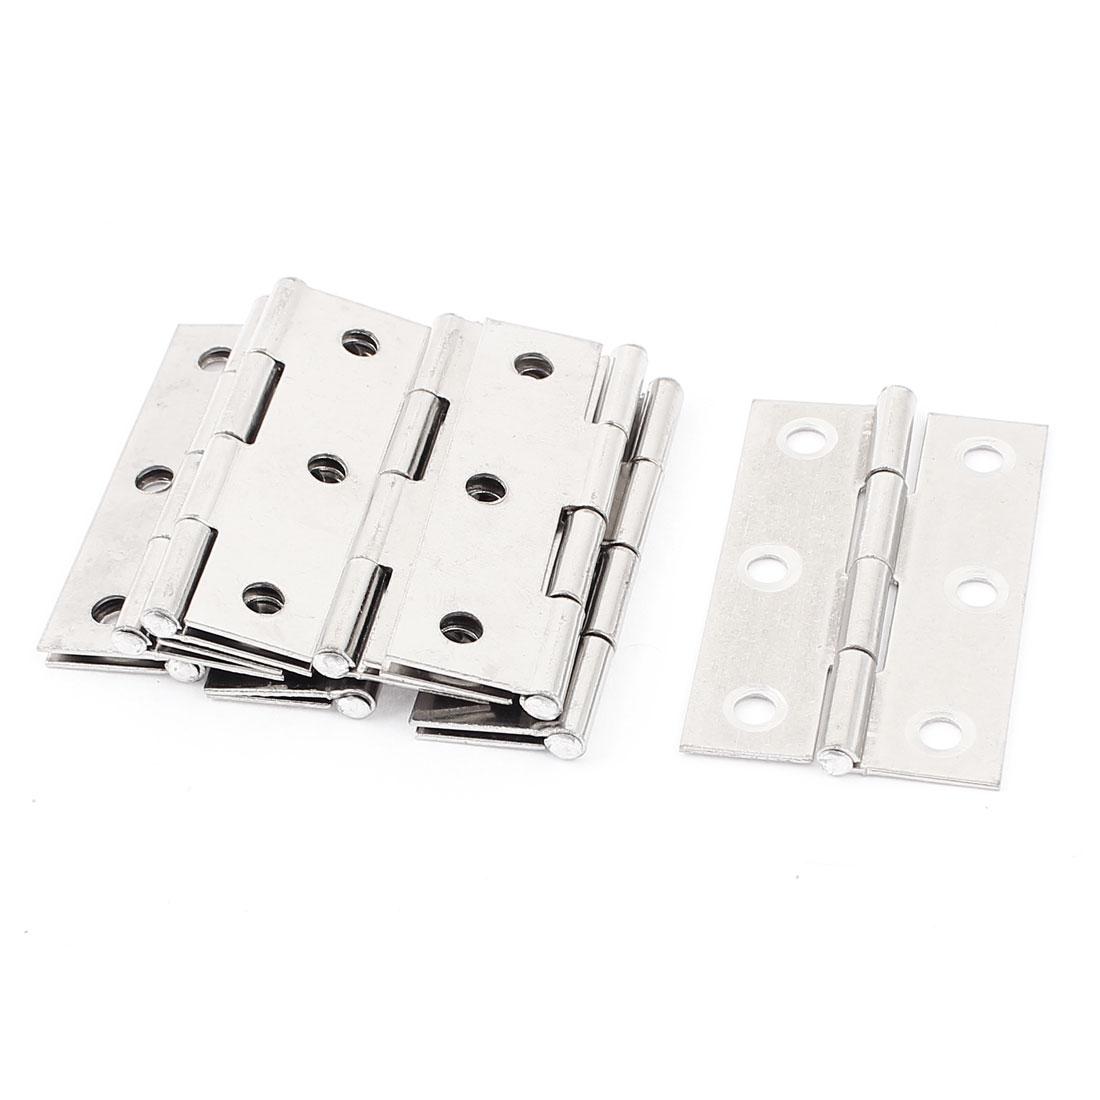 8Pcs 5.5cm x 3.3cm Metal Folding Furniture Cabinet Door Butt Hinge